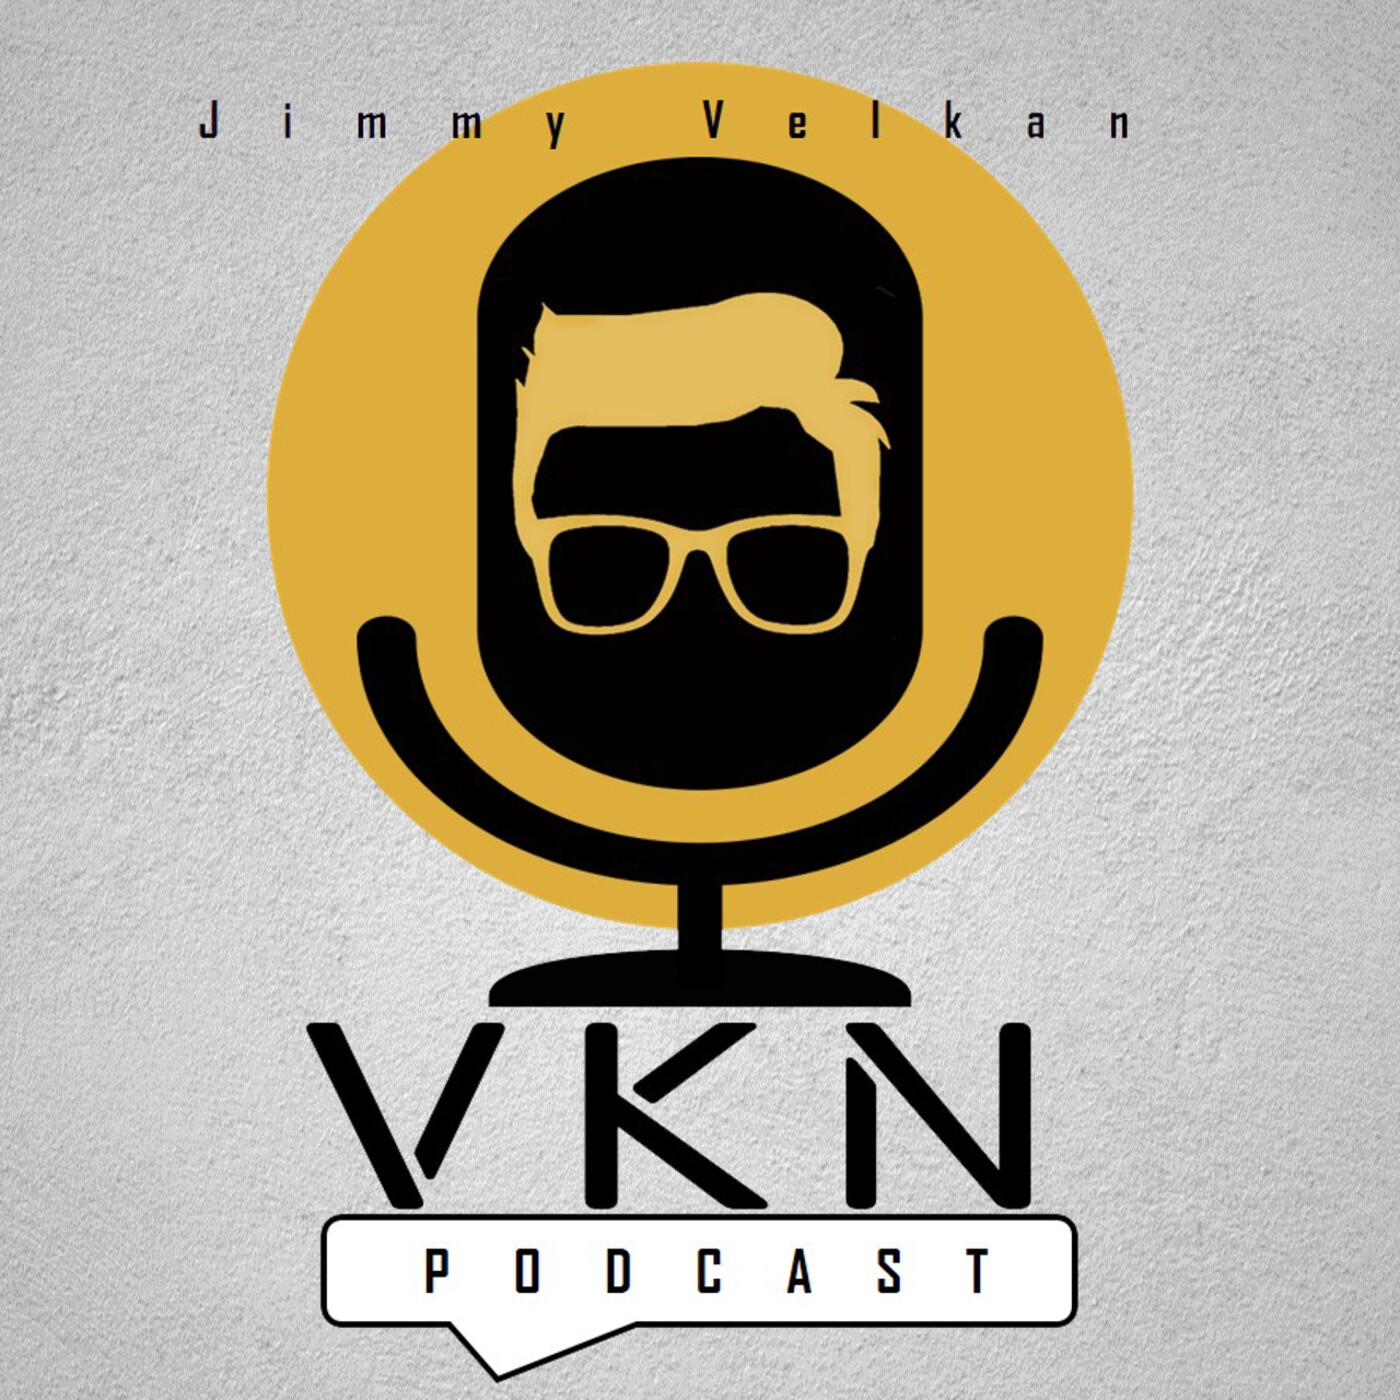 VKN Podcast